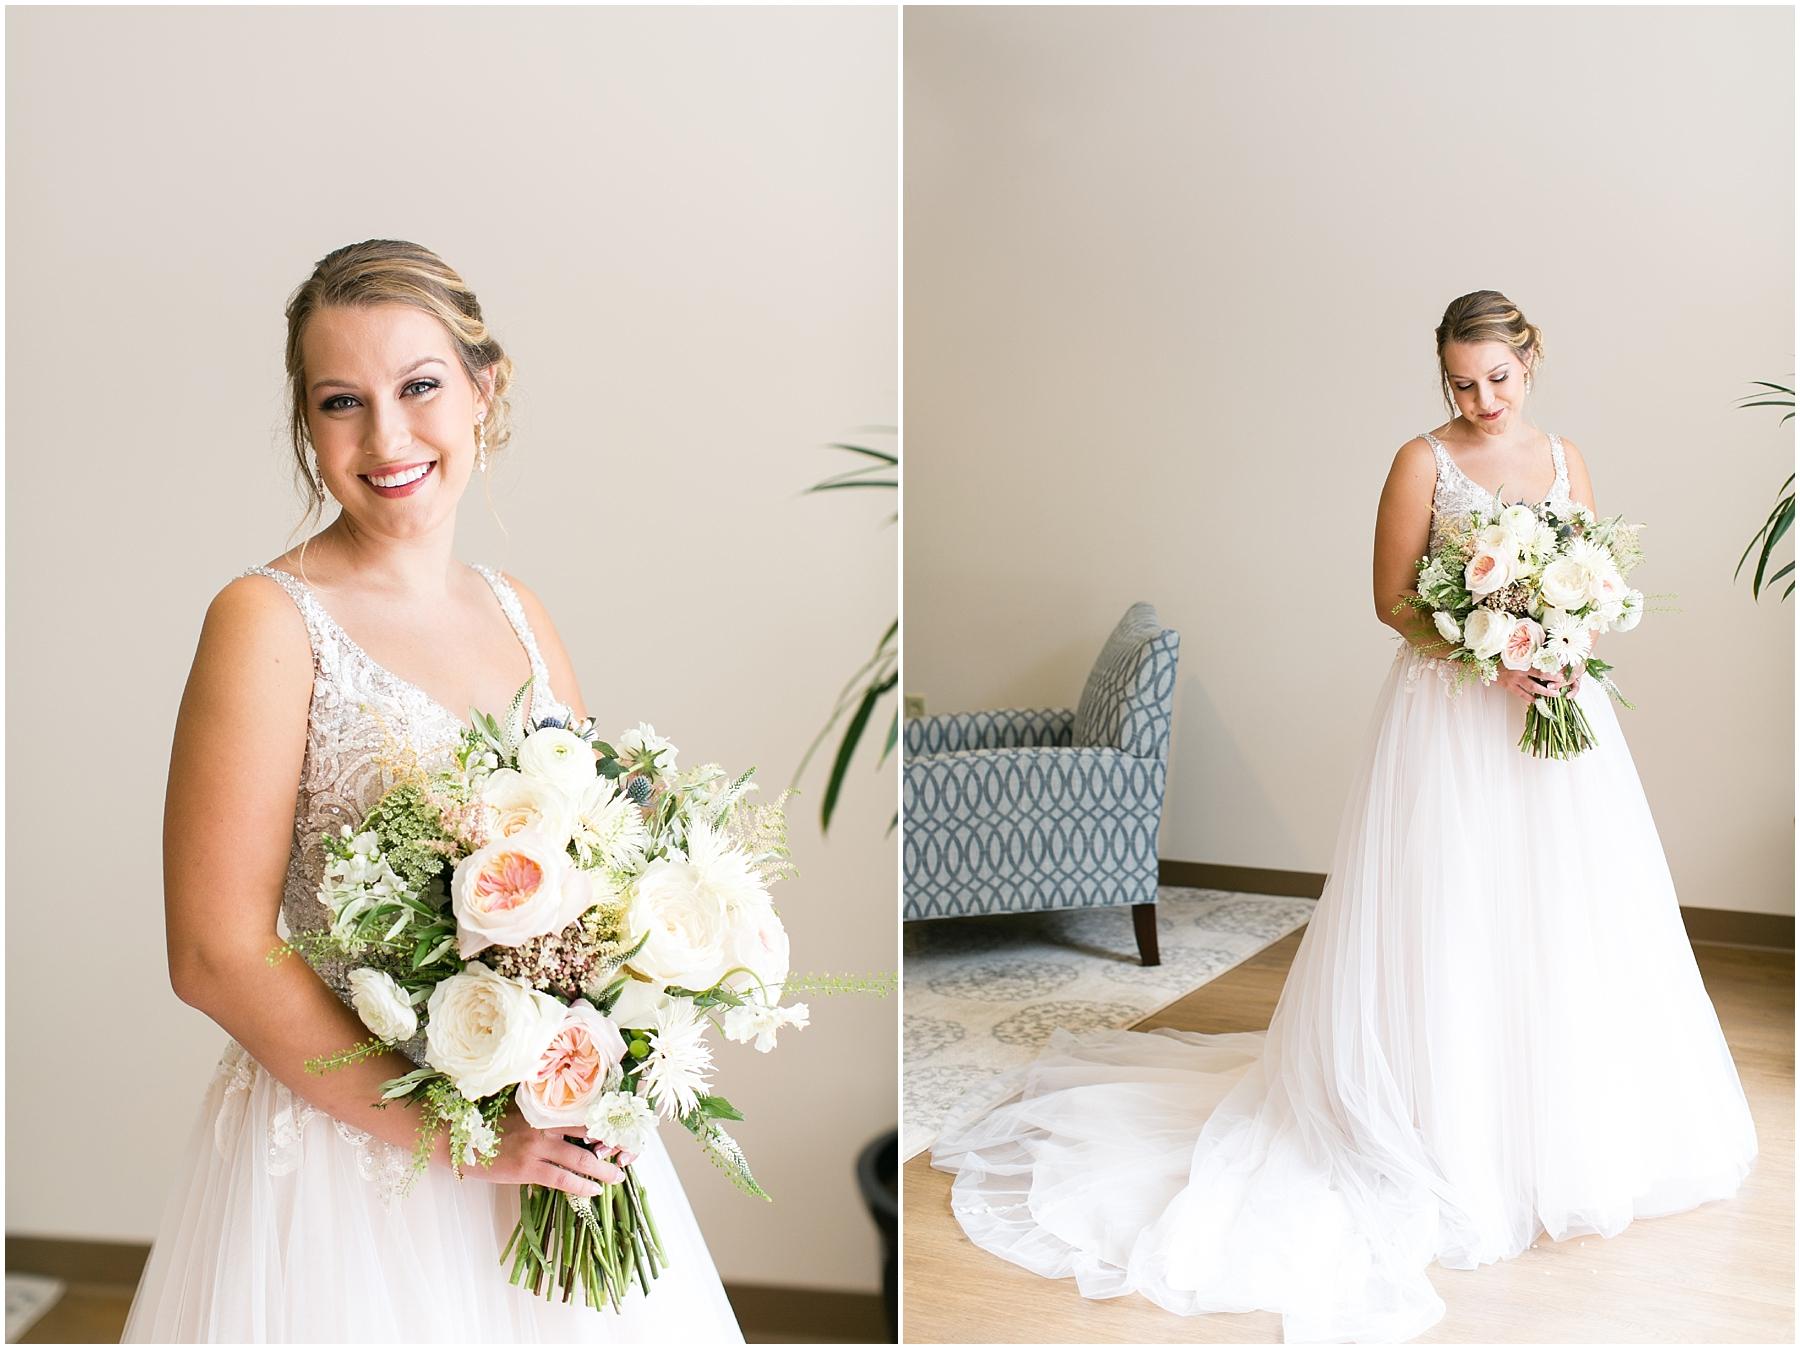 virginia beach wedding photography, bridal portrait, here and now bridal wedding dress, jessica ryan photography, jessica ryan photographer